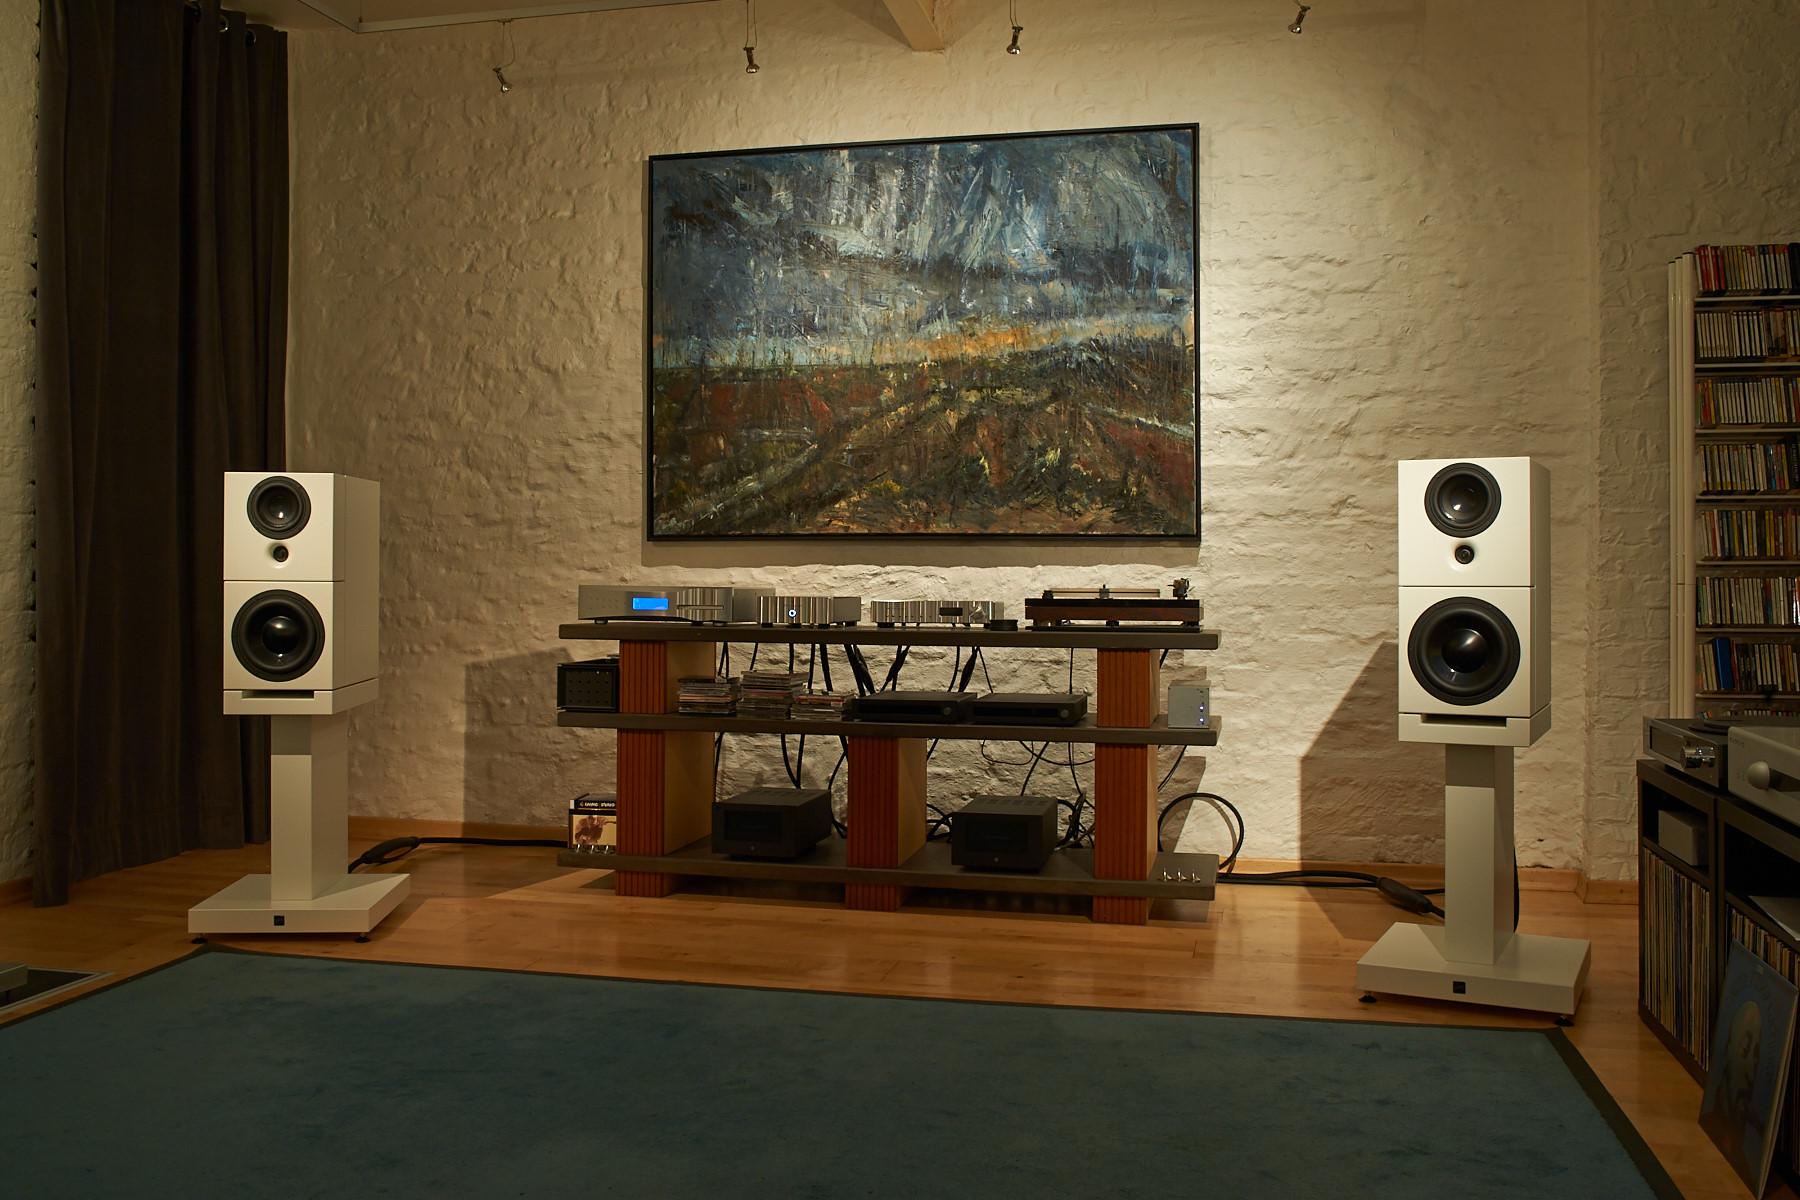 Sehring Audio System 900, Modell 901 STB - Der Monitor auf Bassmodul 1